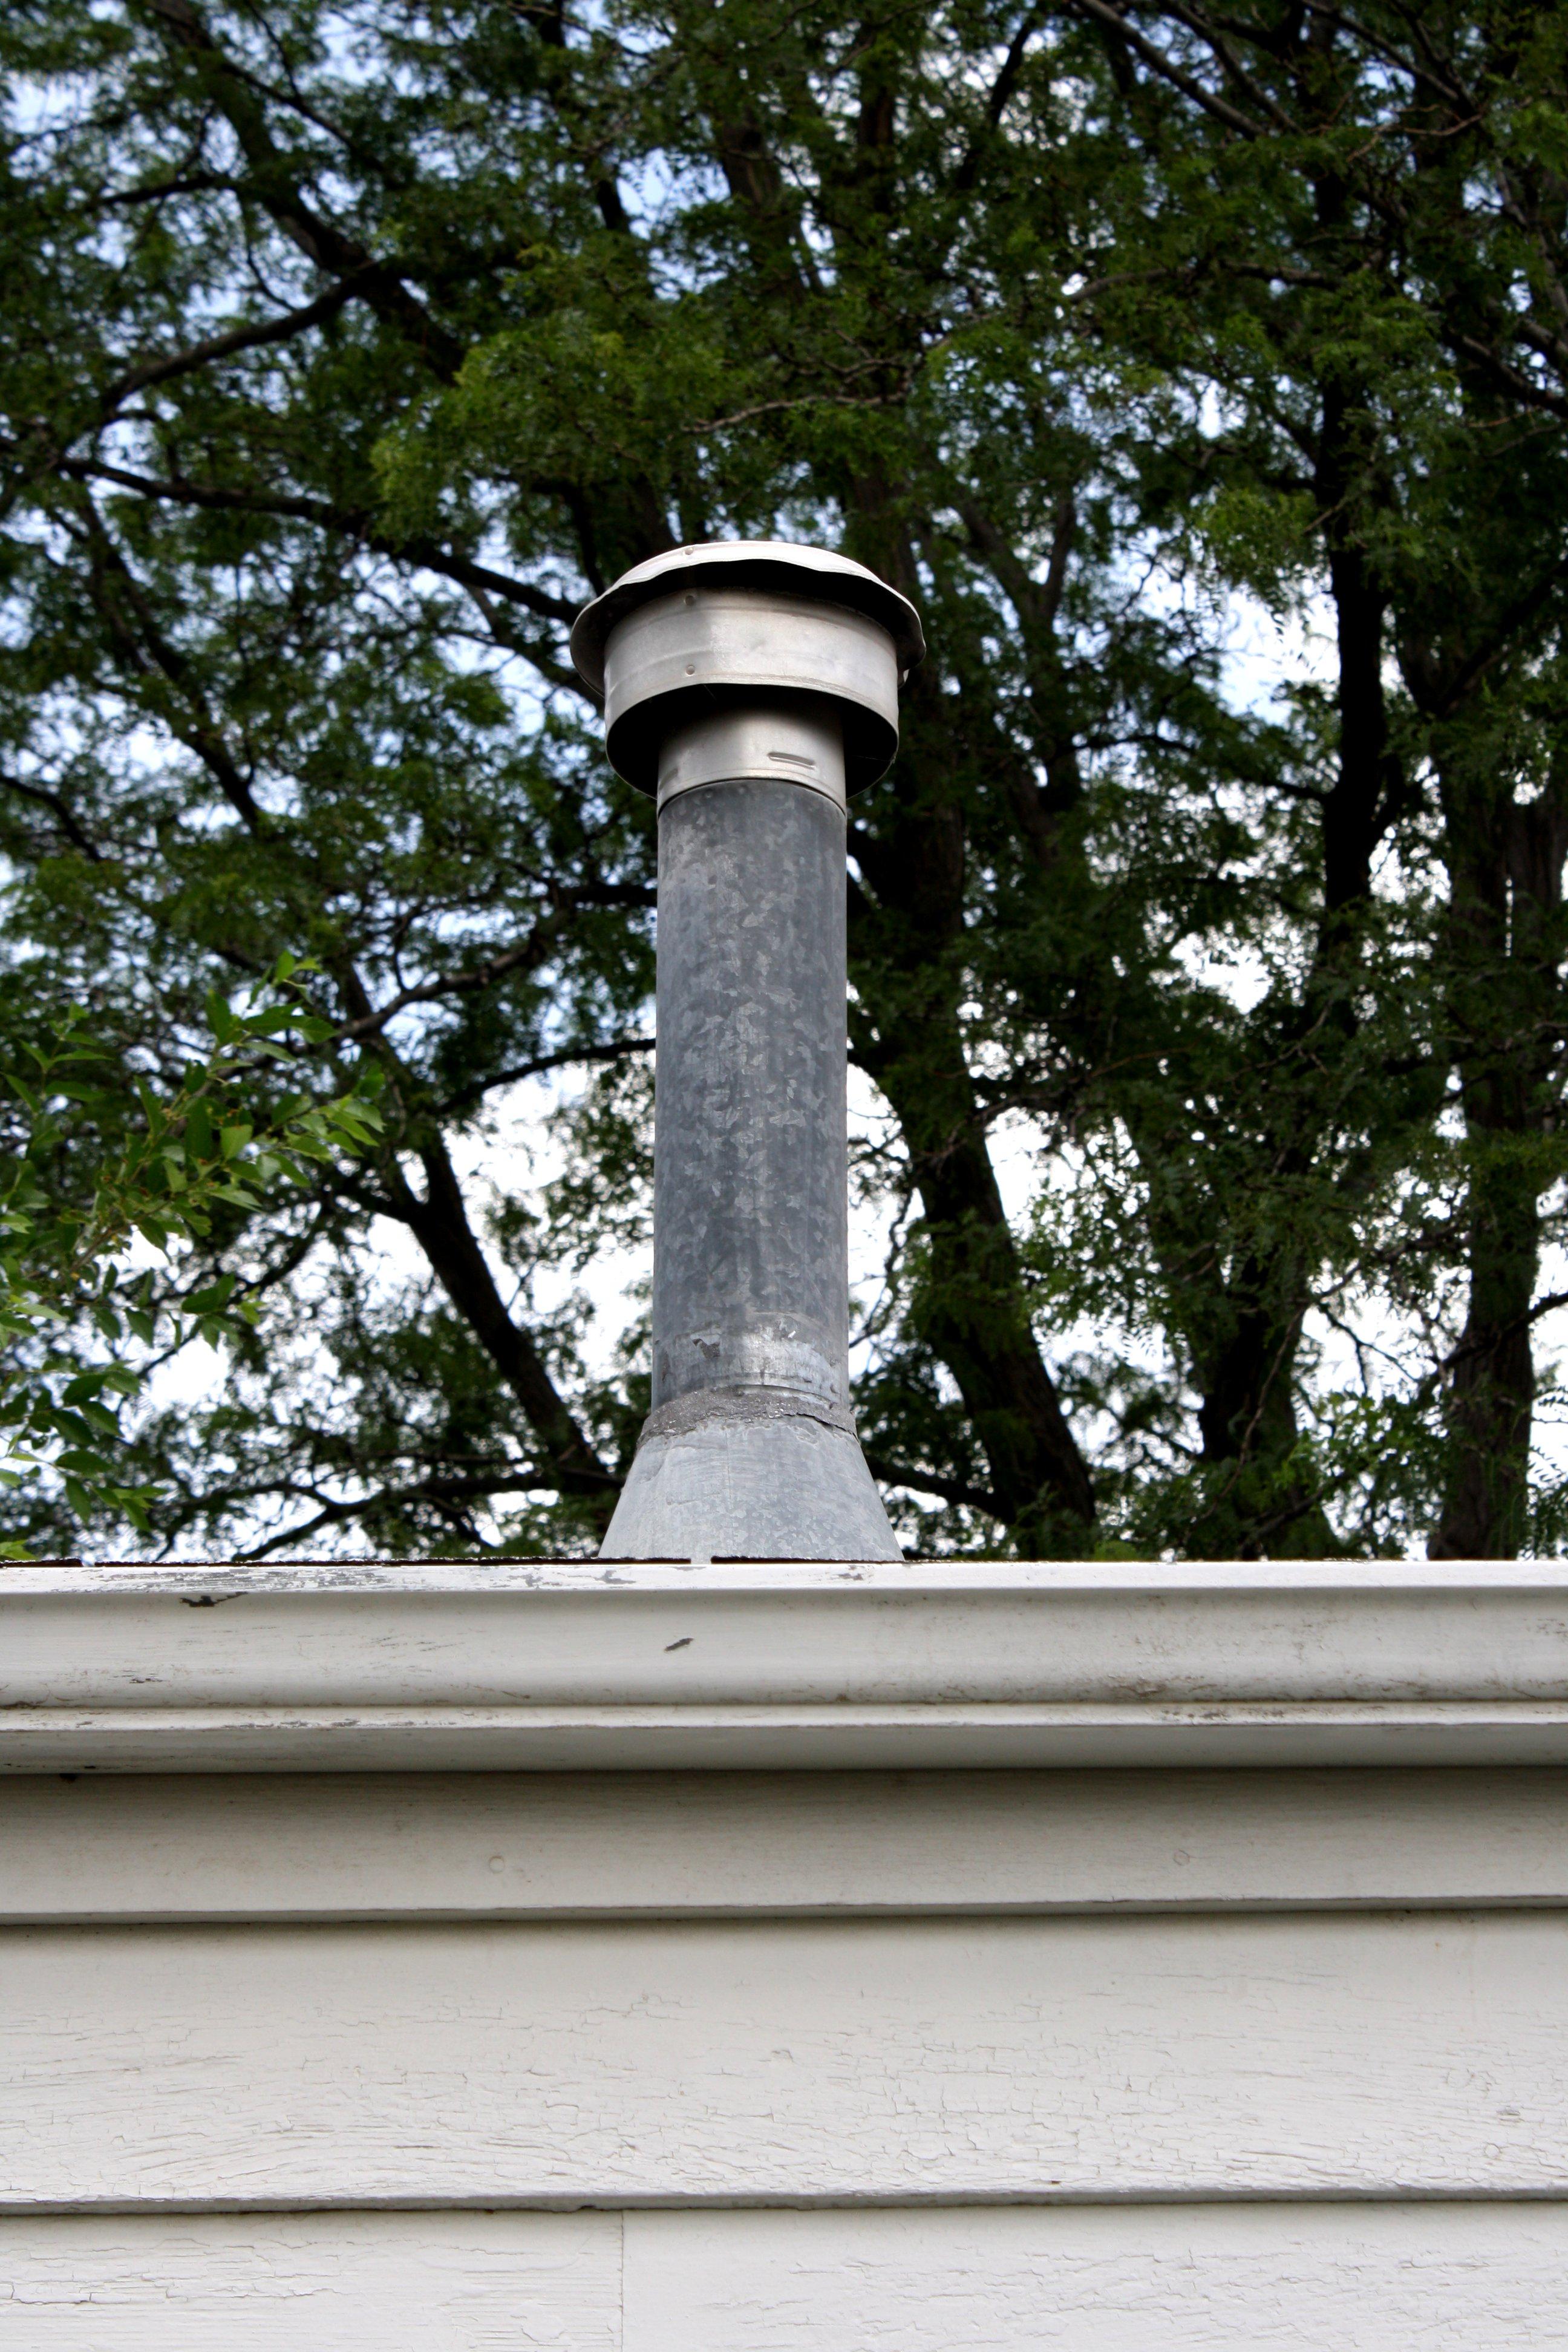 Furnace Roof Vent Or Chimney